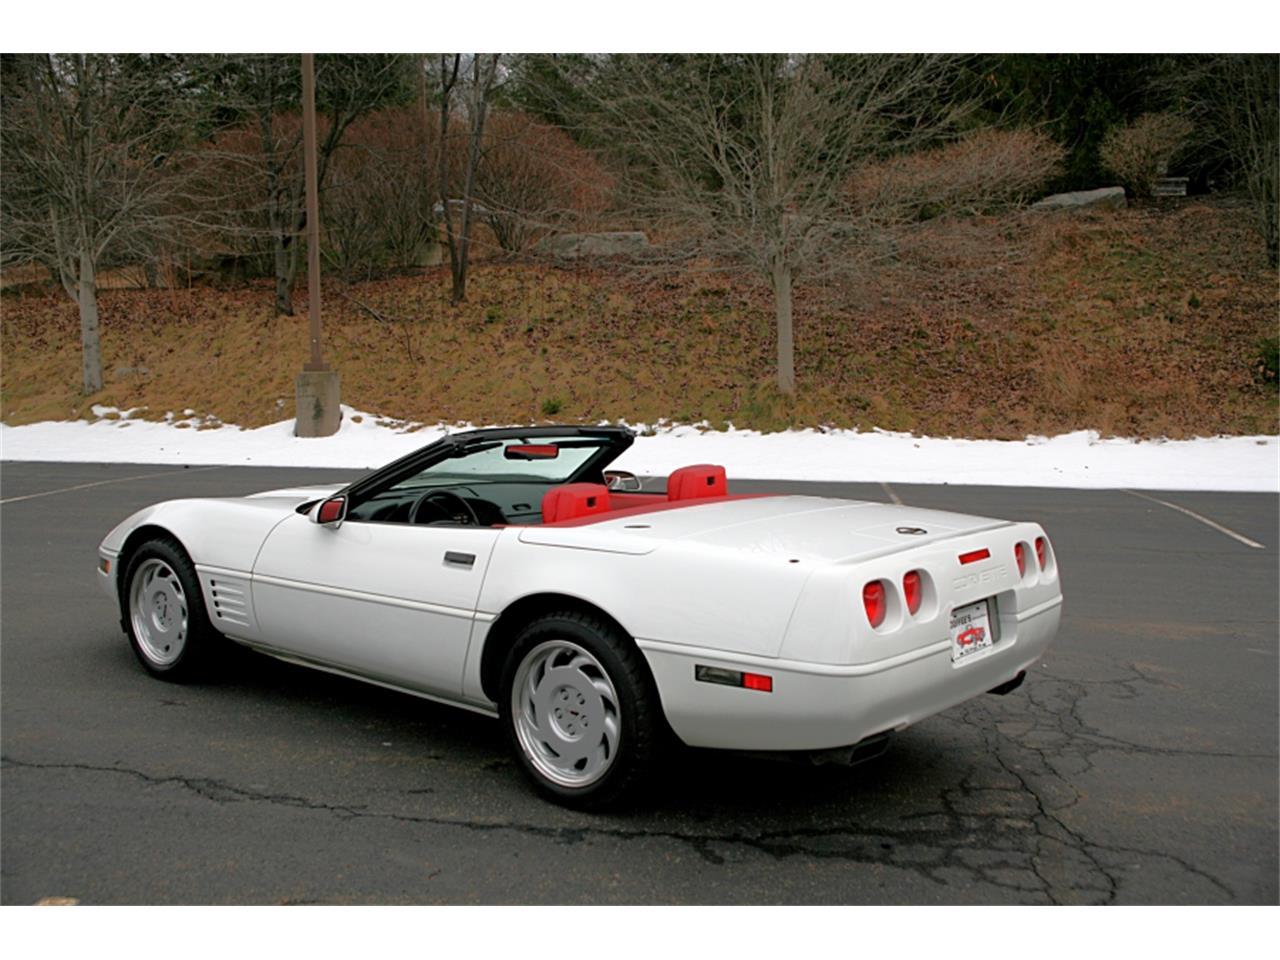 1992 Chevrolet Corvette (CC-1063313) for sale in Old Forge, Pennsylvania